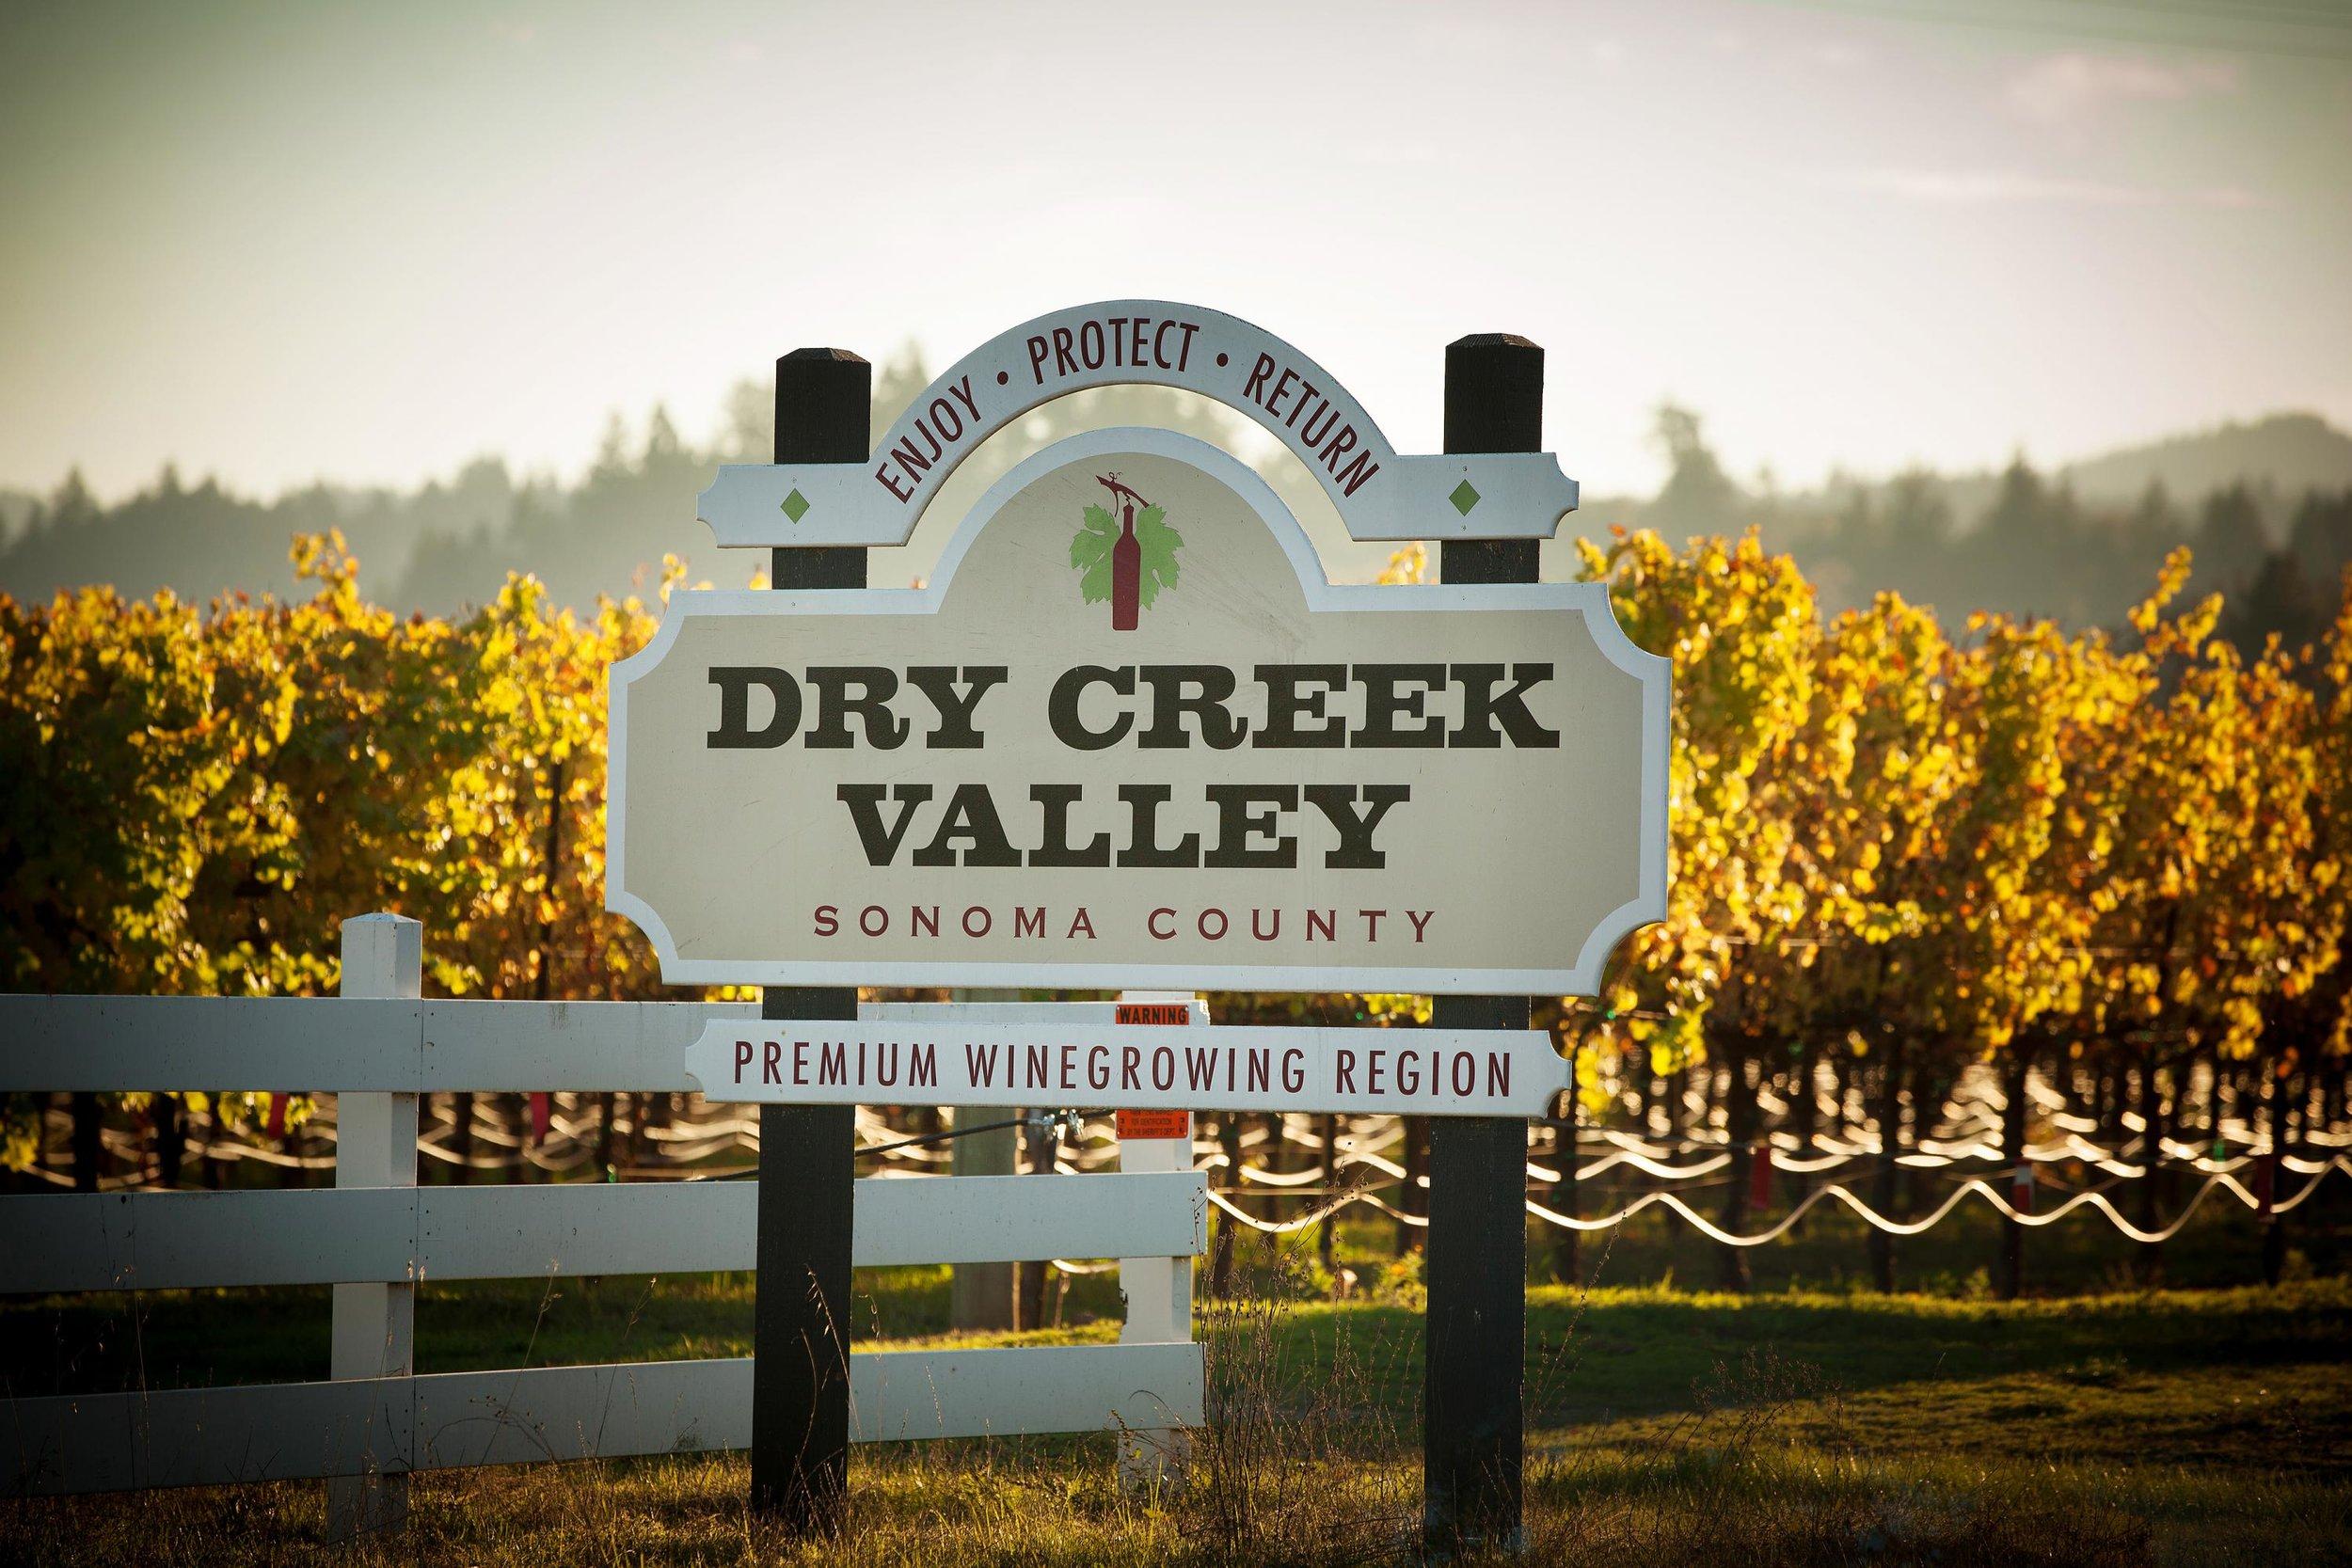 dry-creek-valley-wine-trail-healdsburg-ca-fall-via-magazine-resized.jpg